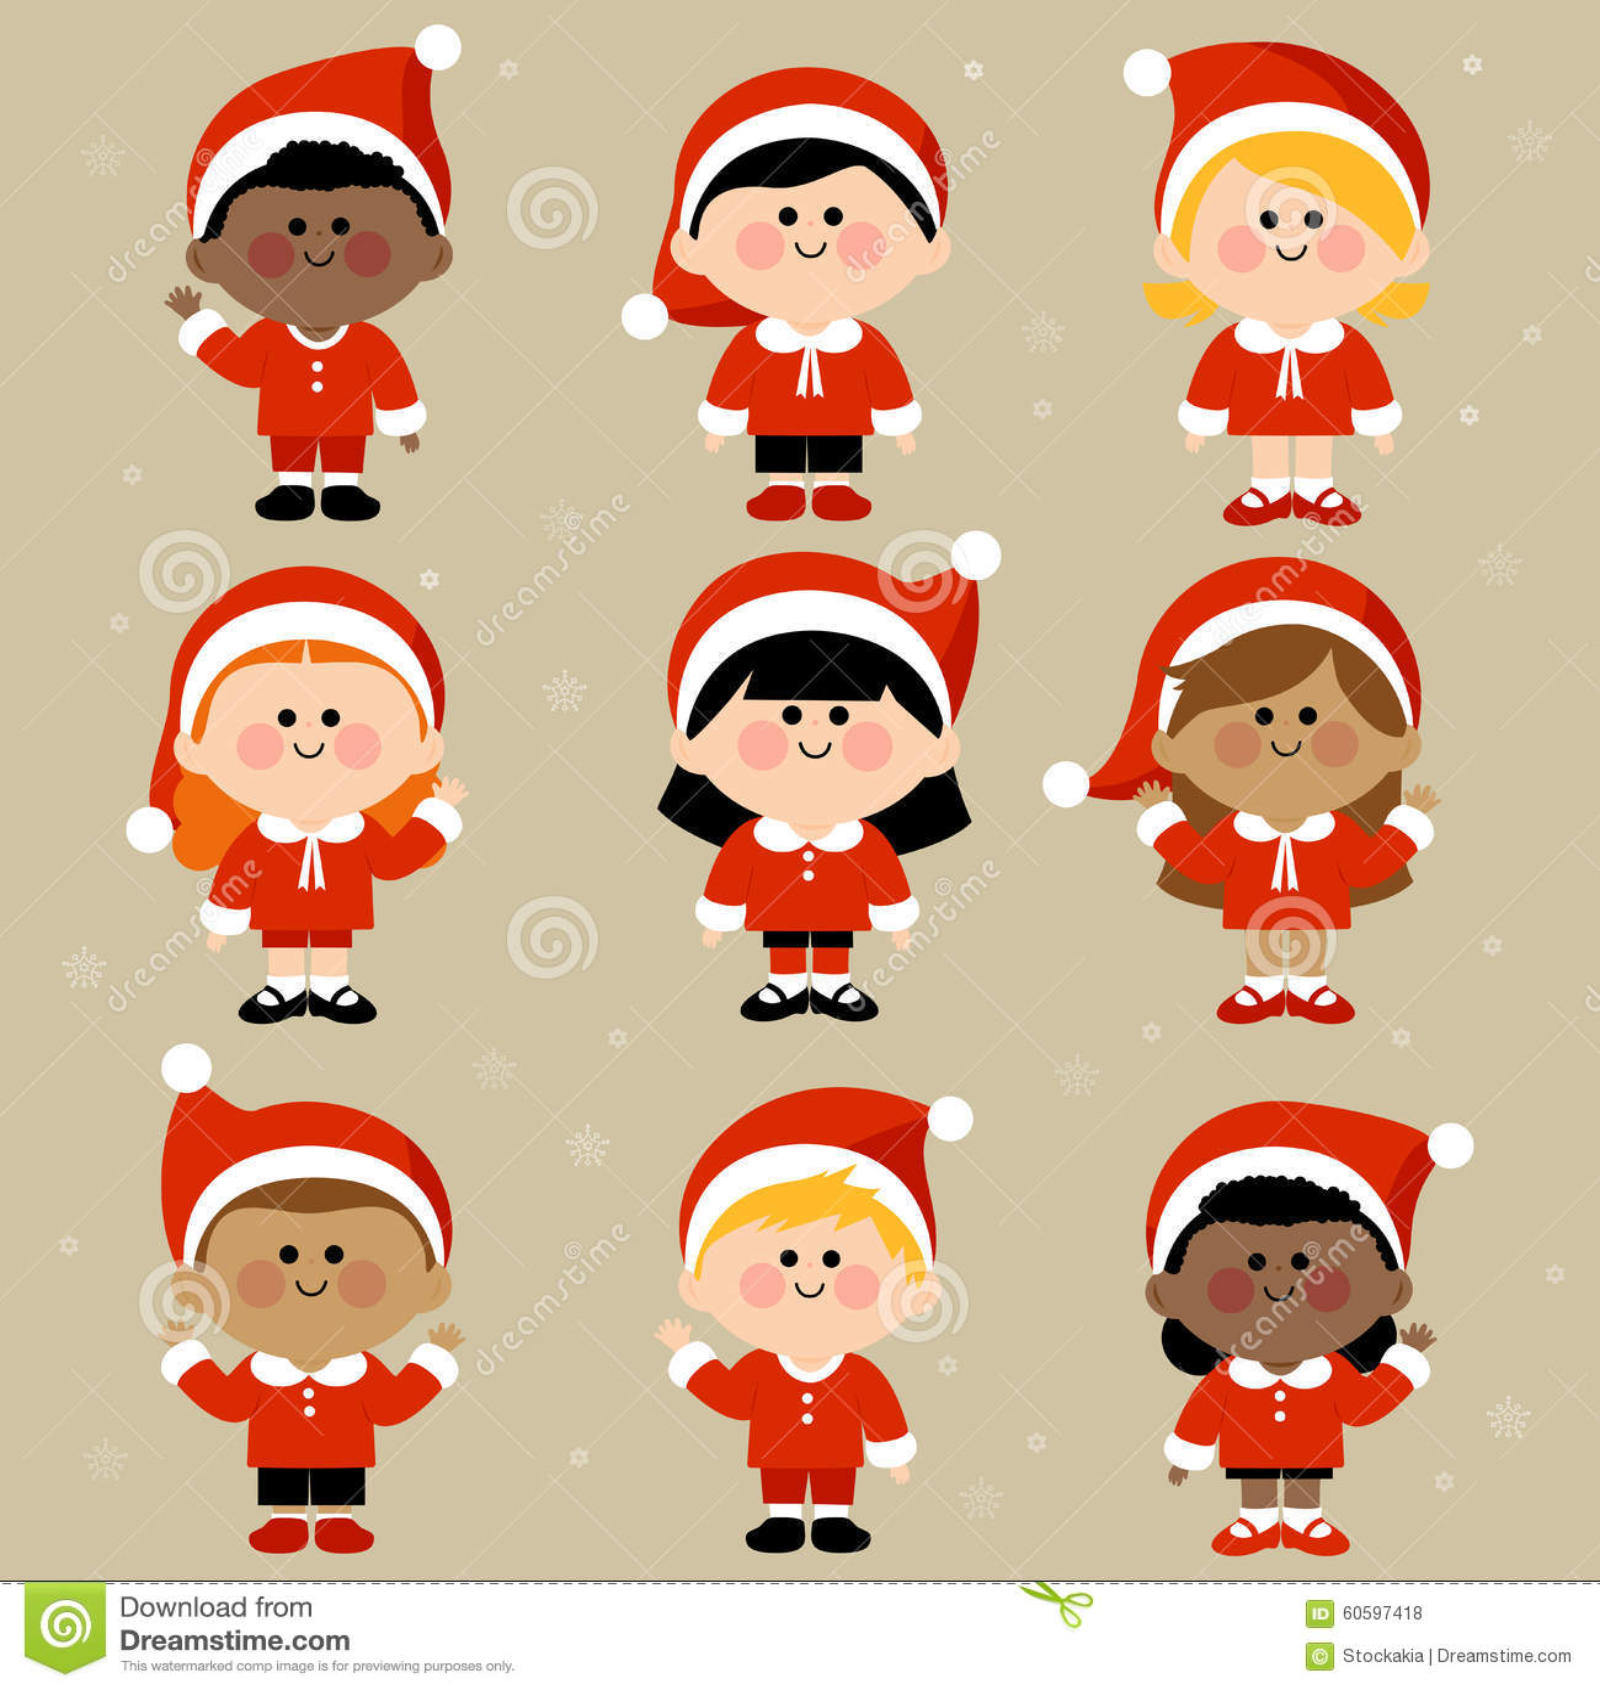 Children Dressed In Christmas Costumes Stock Vector - Illustration ...